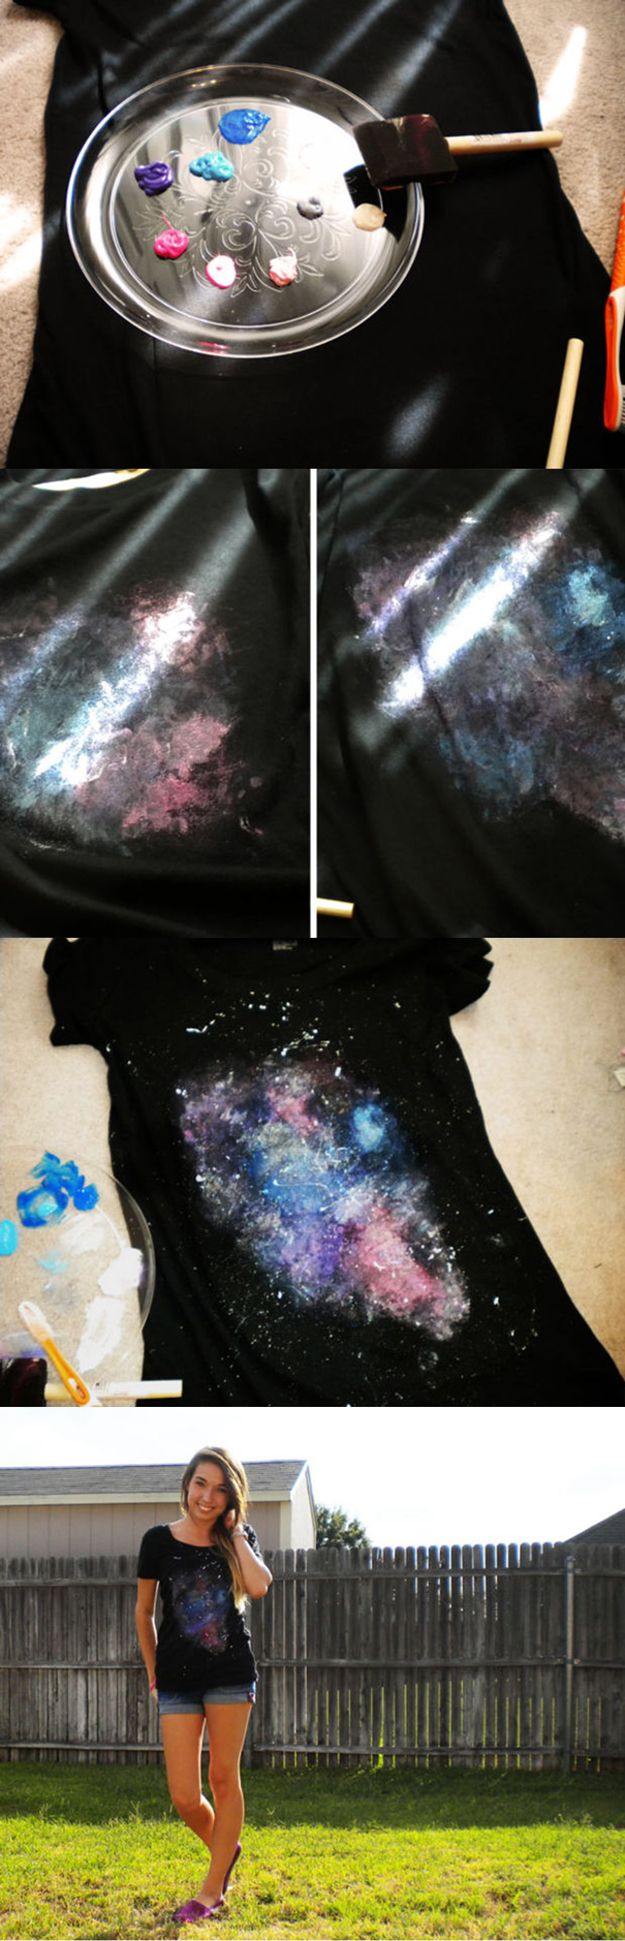 Galaxy Shirt | Cute Top Design Ideas for Teens by DIY Ready at  diyready.com/diy-clothes-sewing-blouses-tutorial/